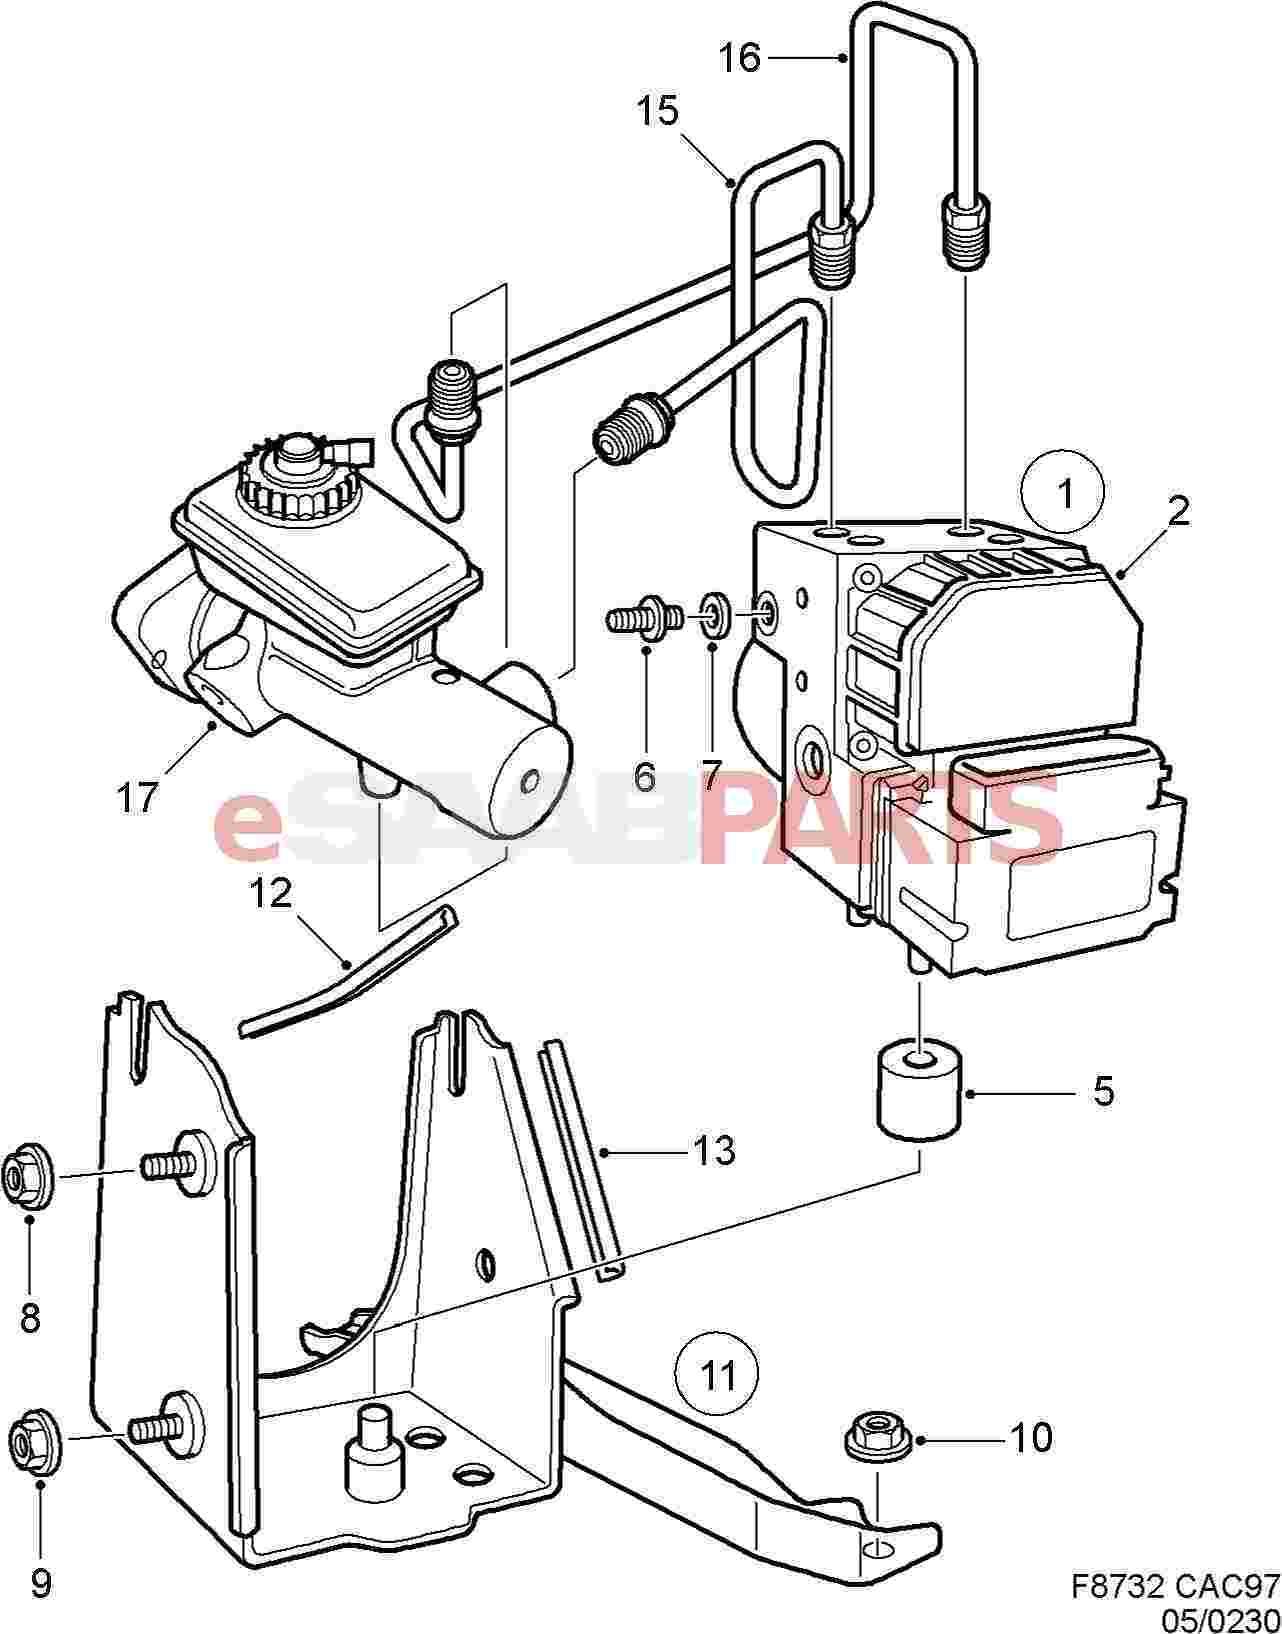 eSaabParts.com - Saab 9-5 (9600) > Brakes Parts > Hydraulic Braking System  > Hydraulic Braking System (1999-2001)